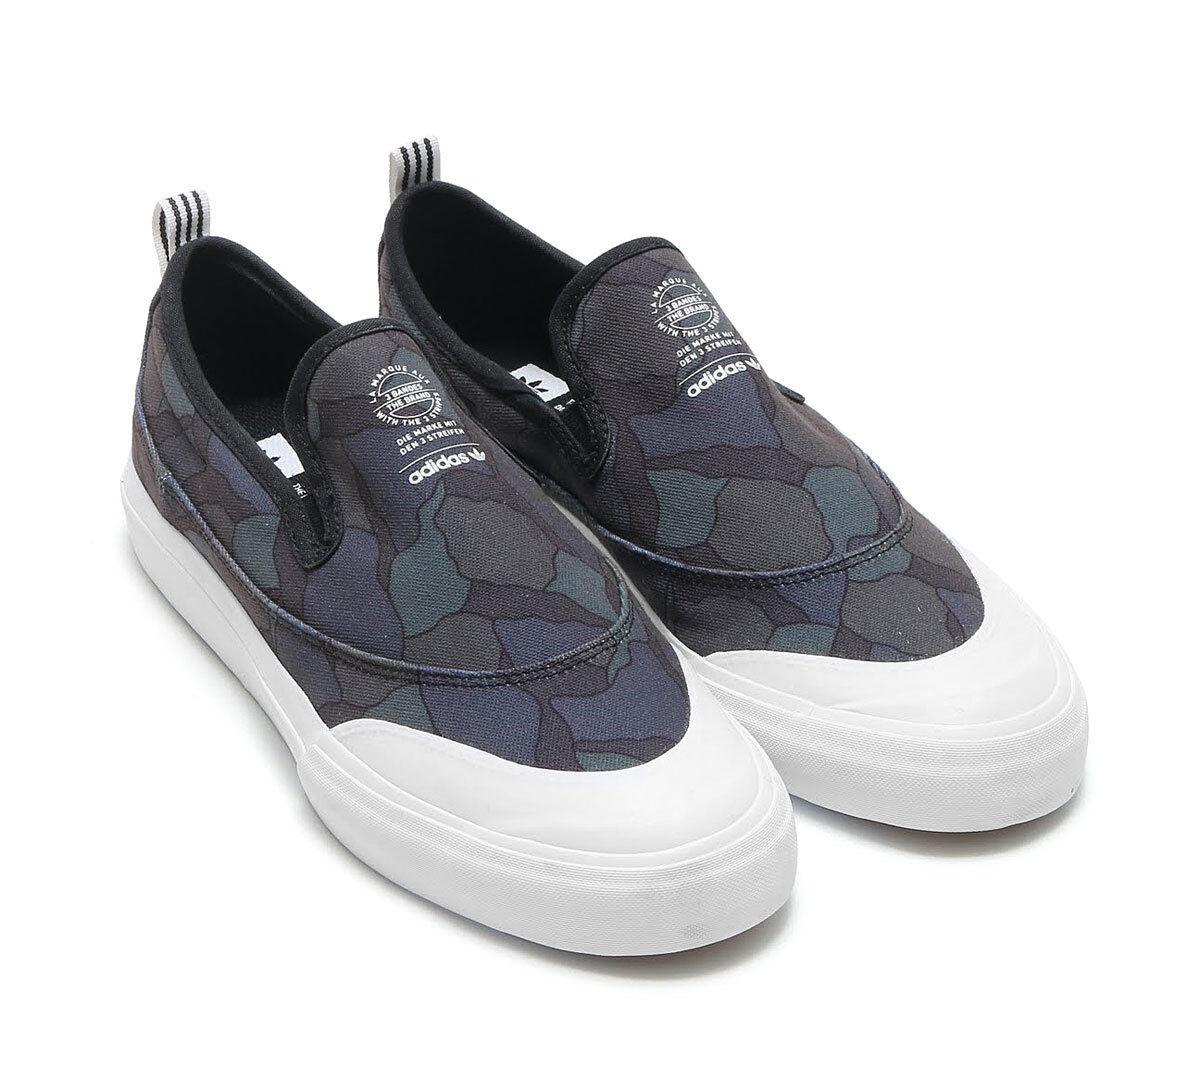 NWOB Adidas Matchcourt Slip-On Skateboard Shoe Core Black White Men's Size 10